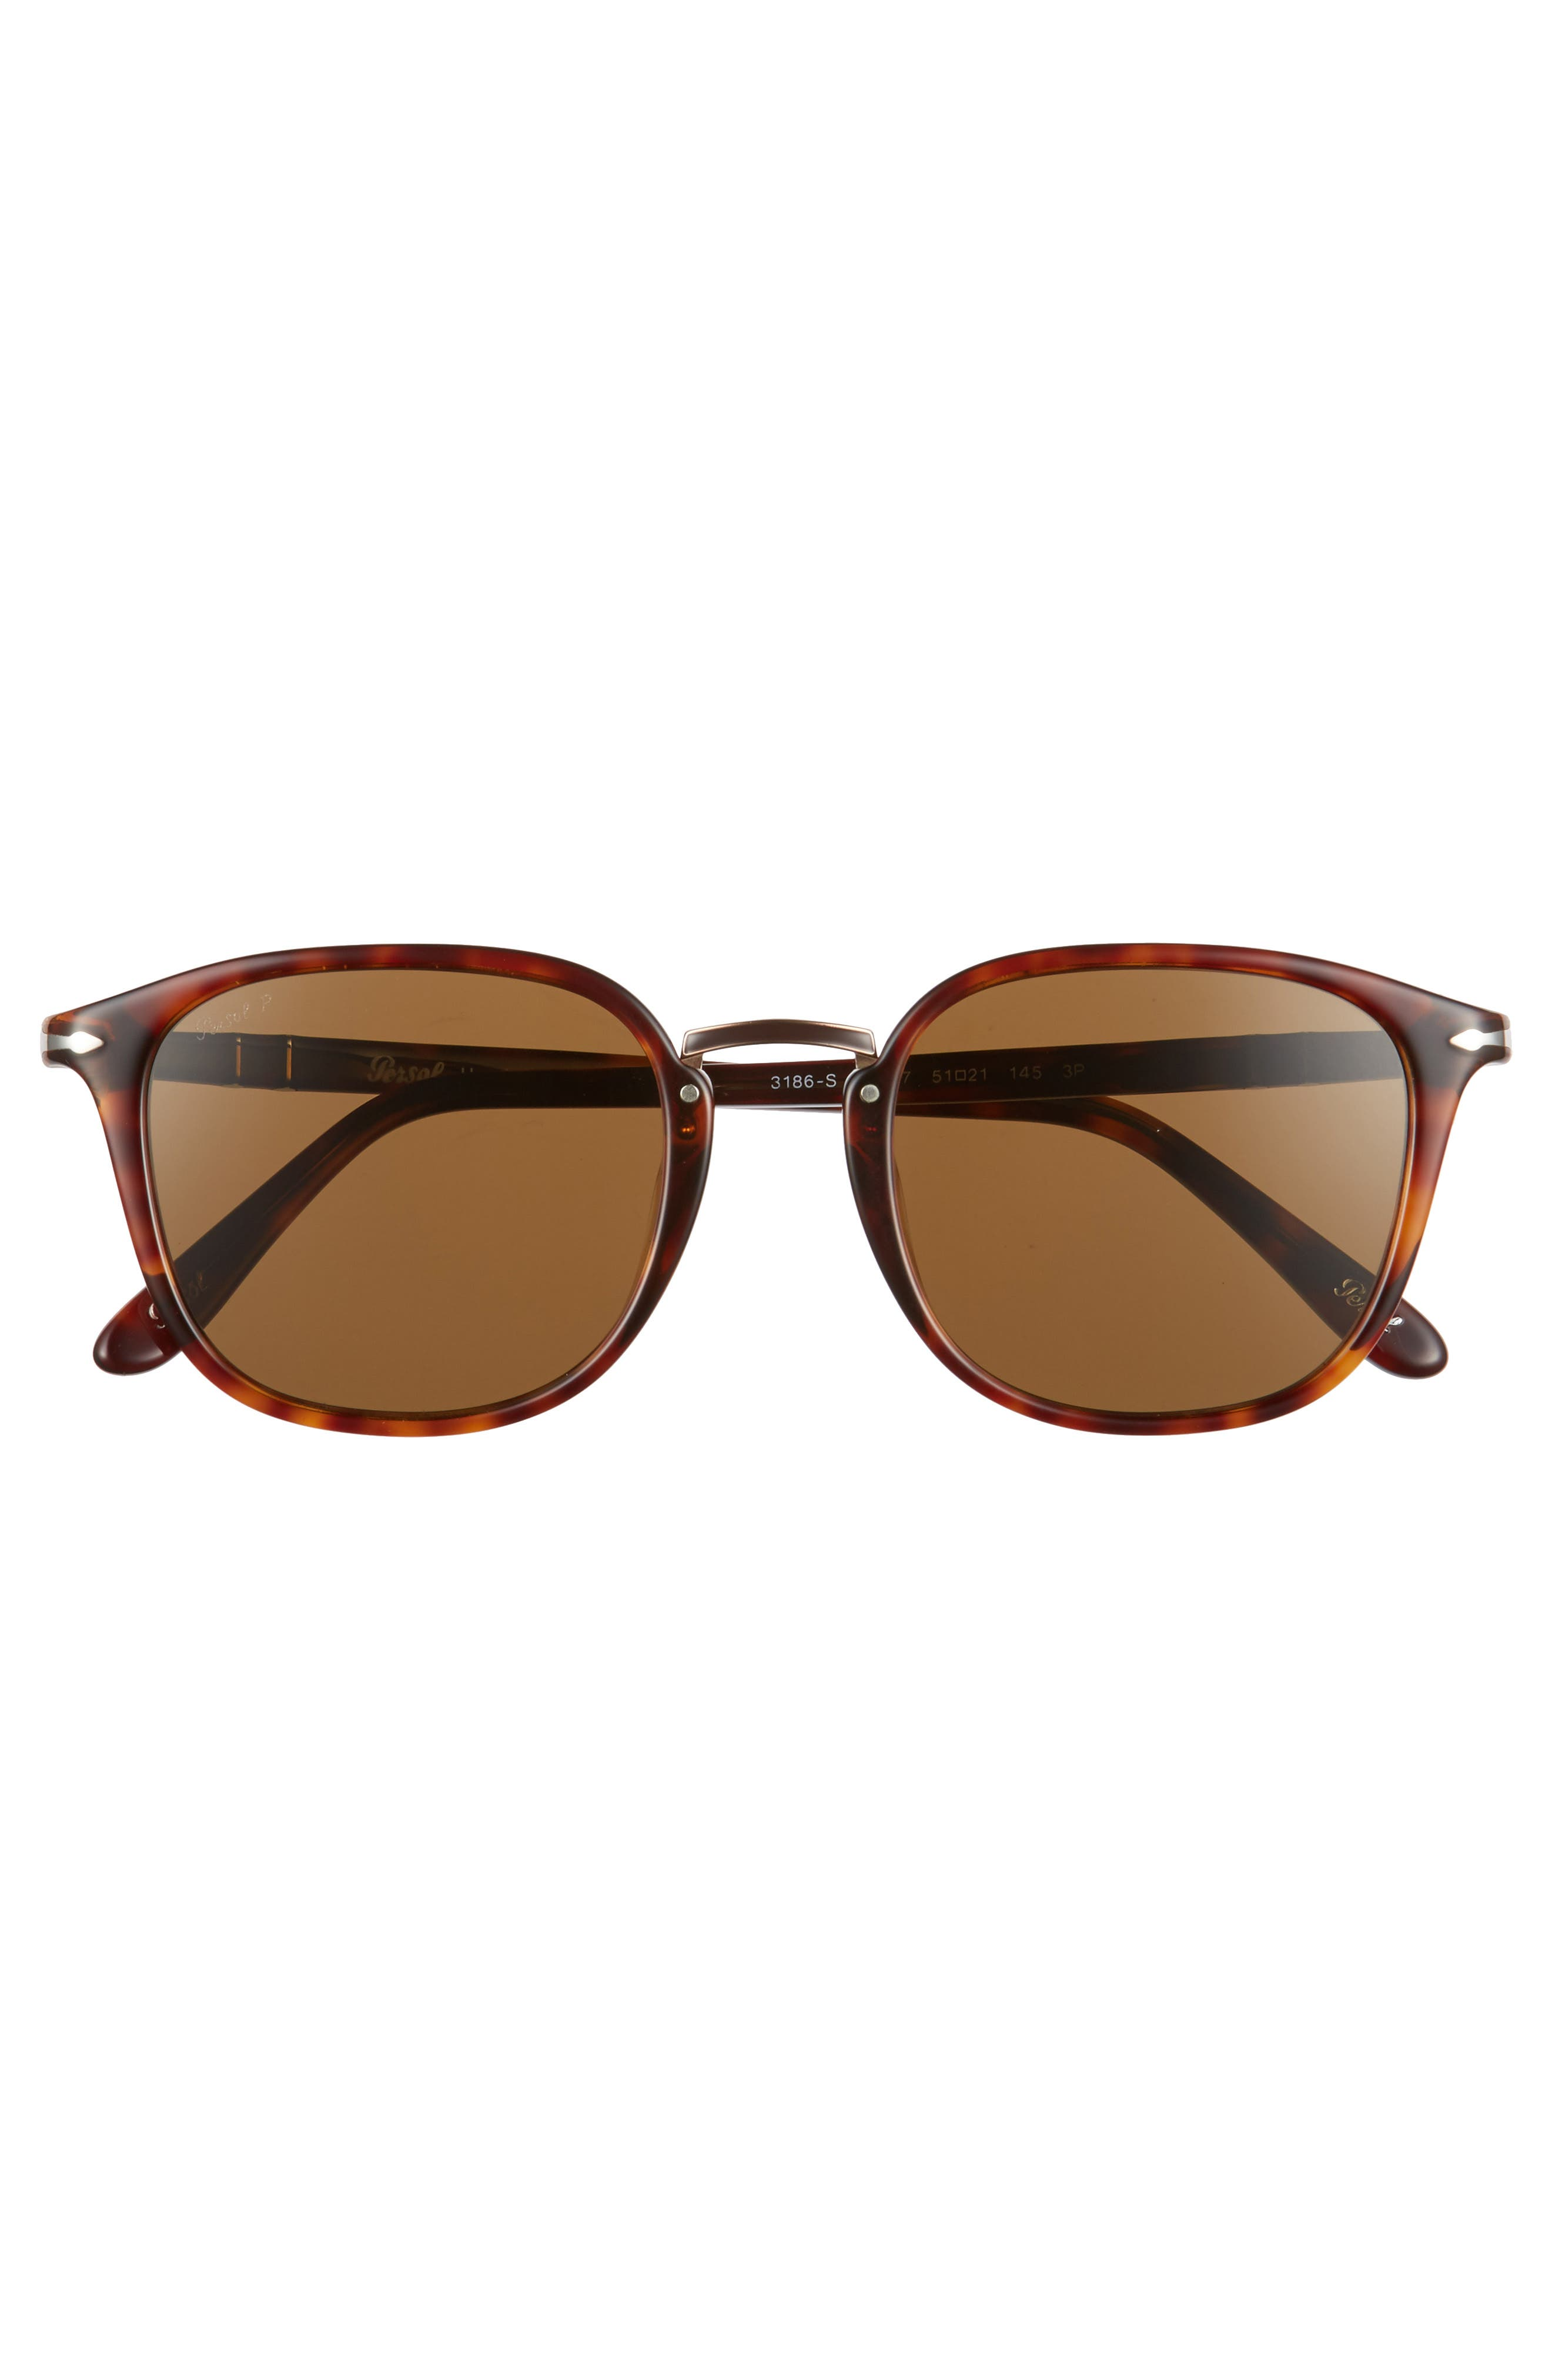 Phantos 51mm Polarized Sunglasses,                             Alternate thumbnail 2, color,                             Tortoise Polarized